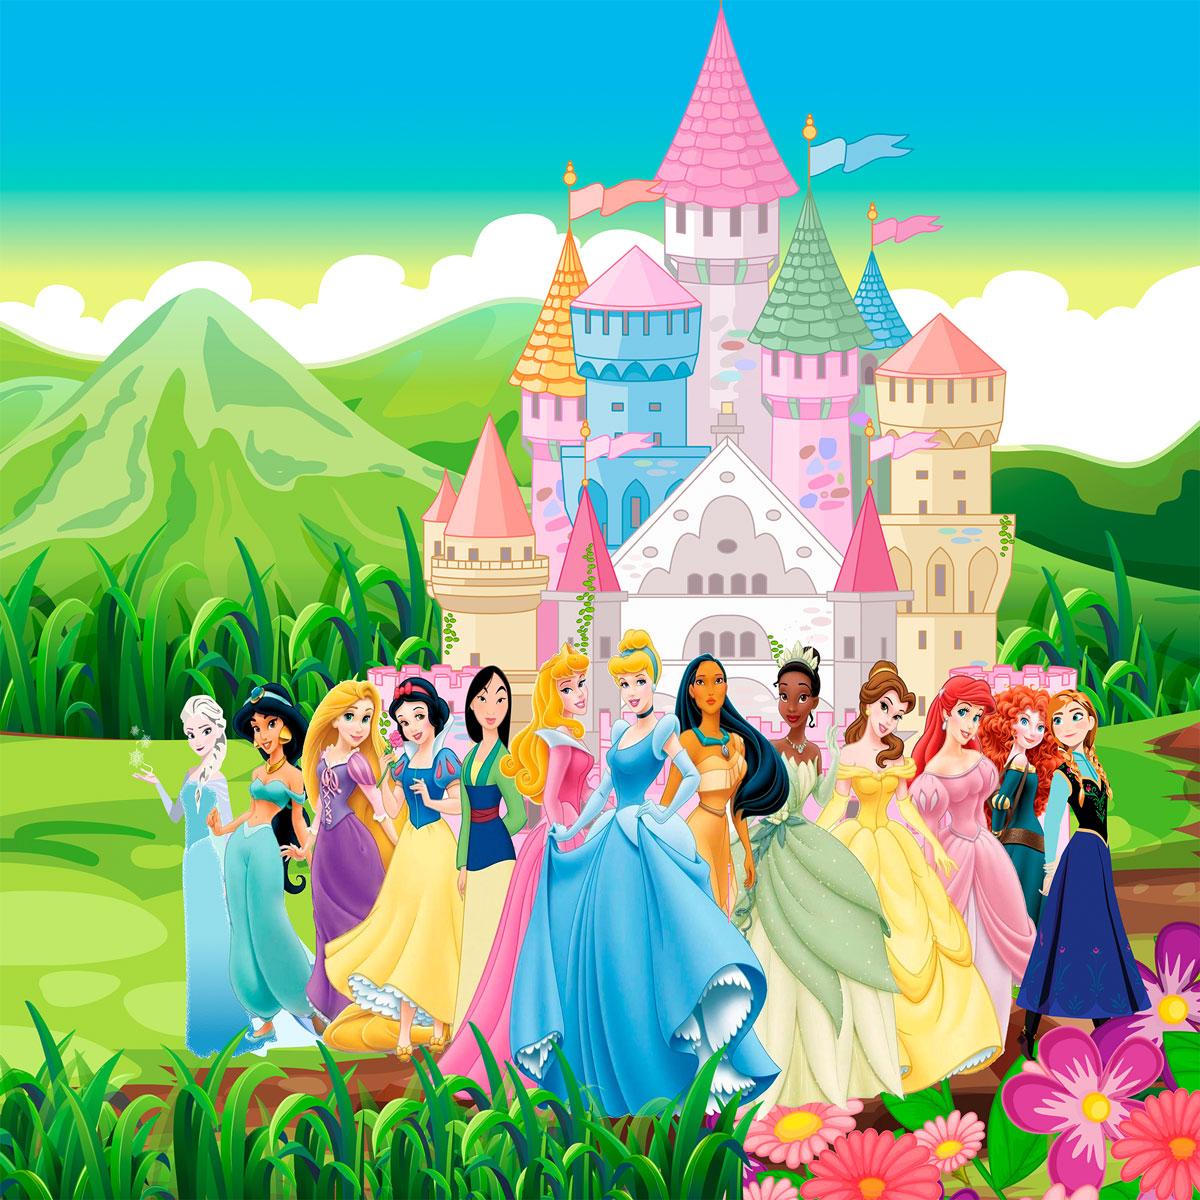 Papel de Parede Adesivo, Infantil Princesas Jardim  - Final Decor